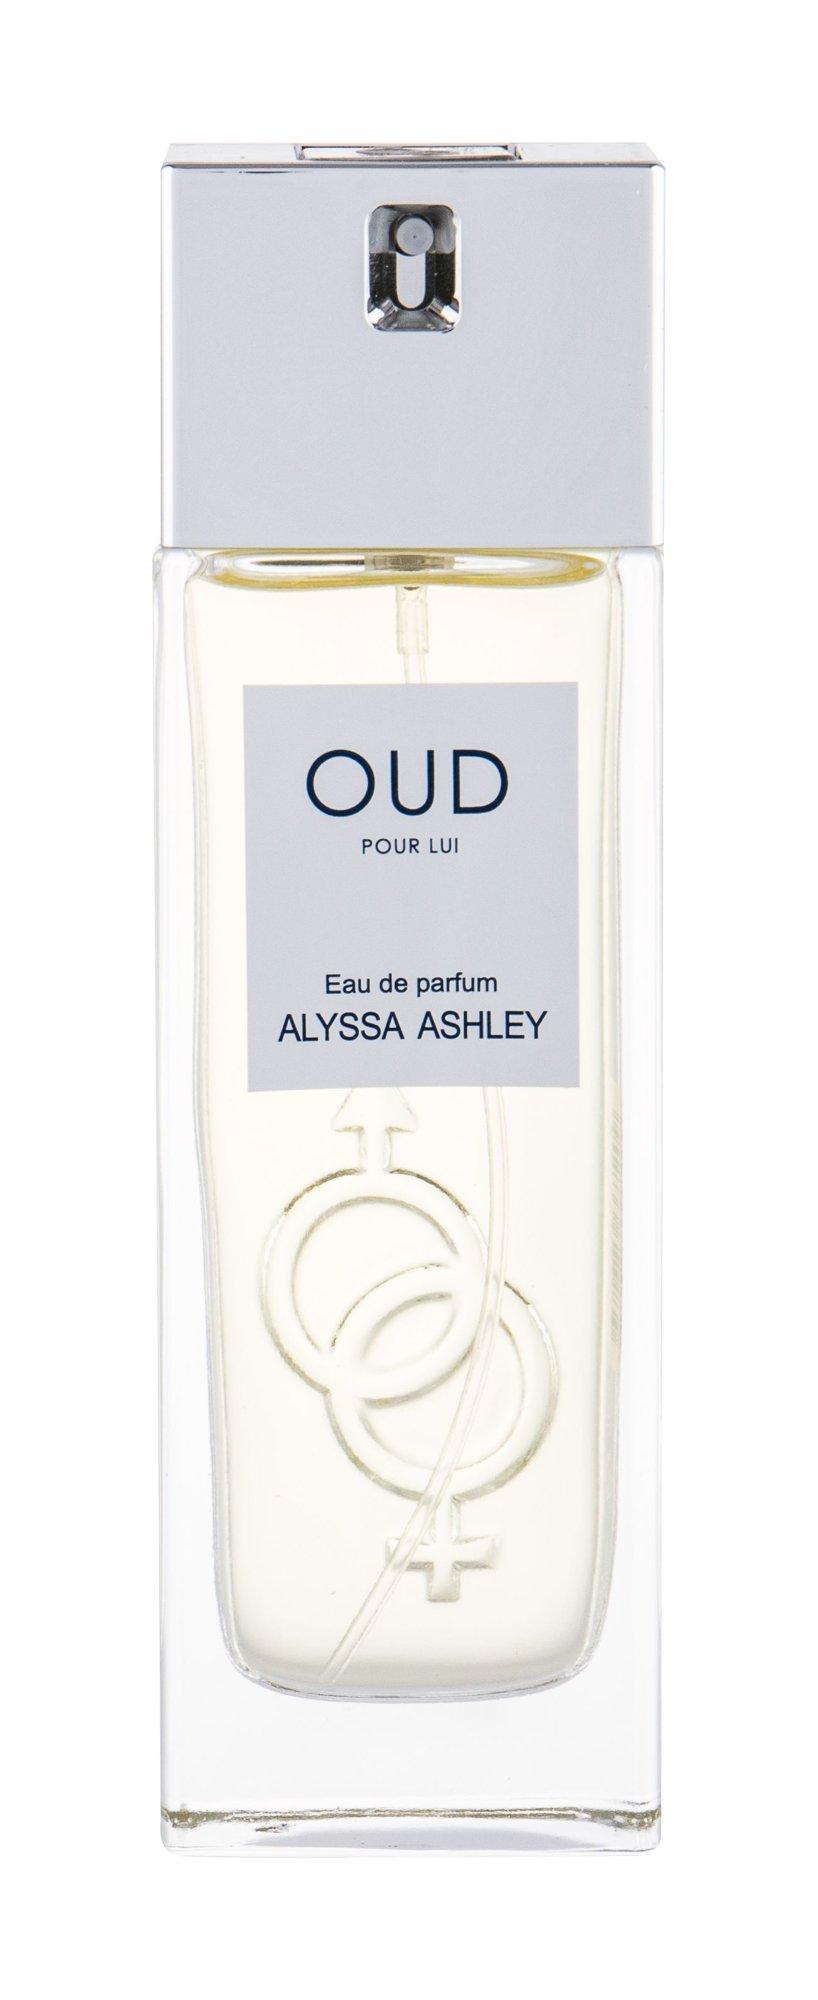 Alyssa Ashley Oud Eau de Parfum 50ml